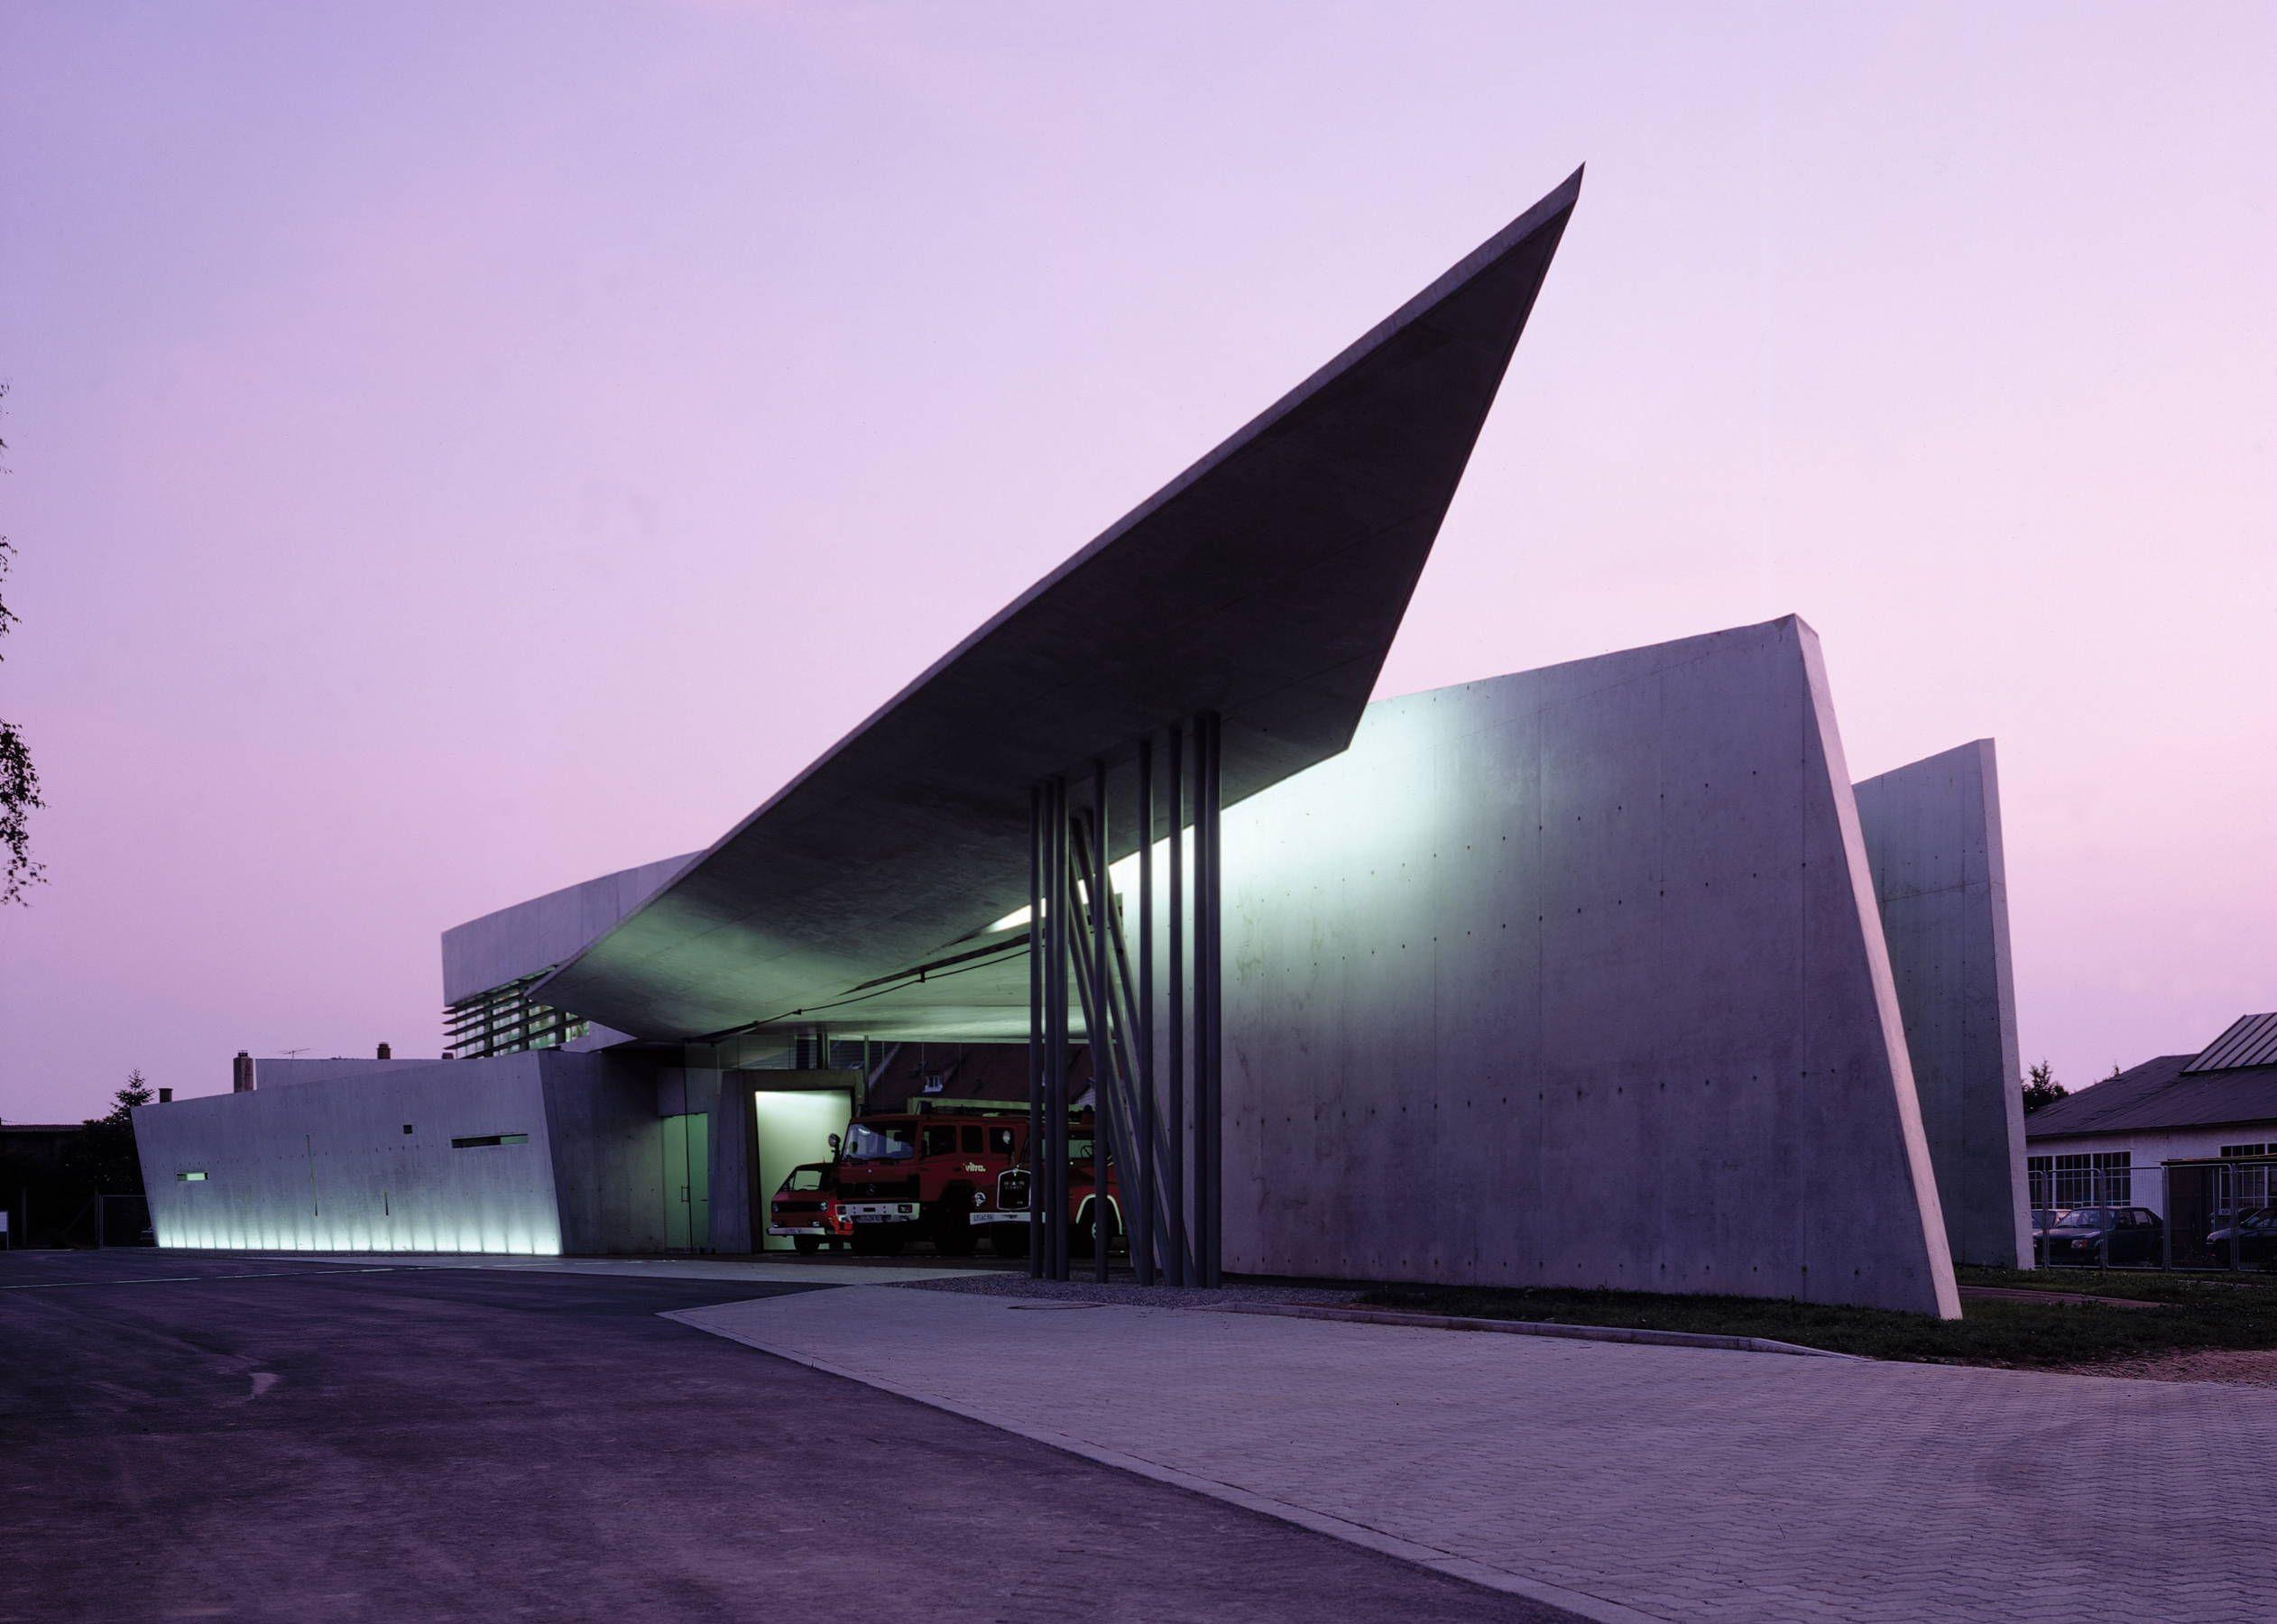 Vitra Fire Station - Architecture - Zaha Hadid Architects | Other ...